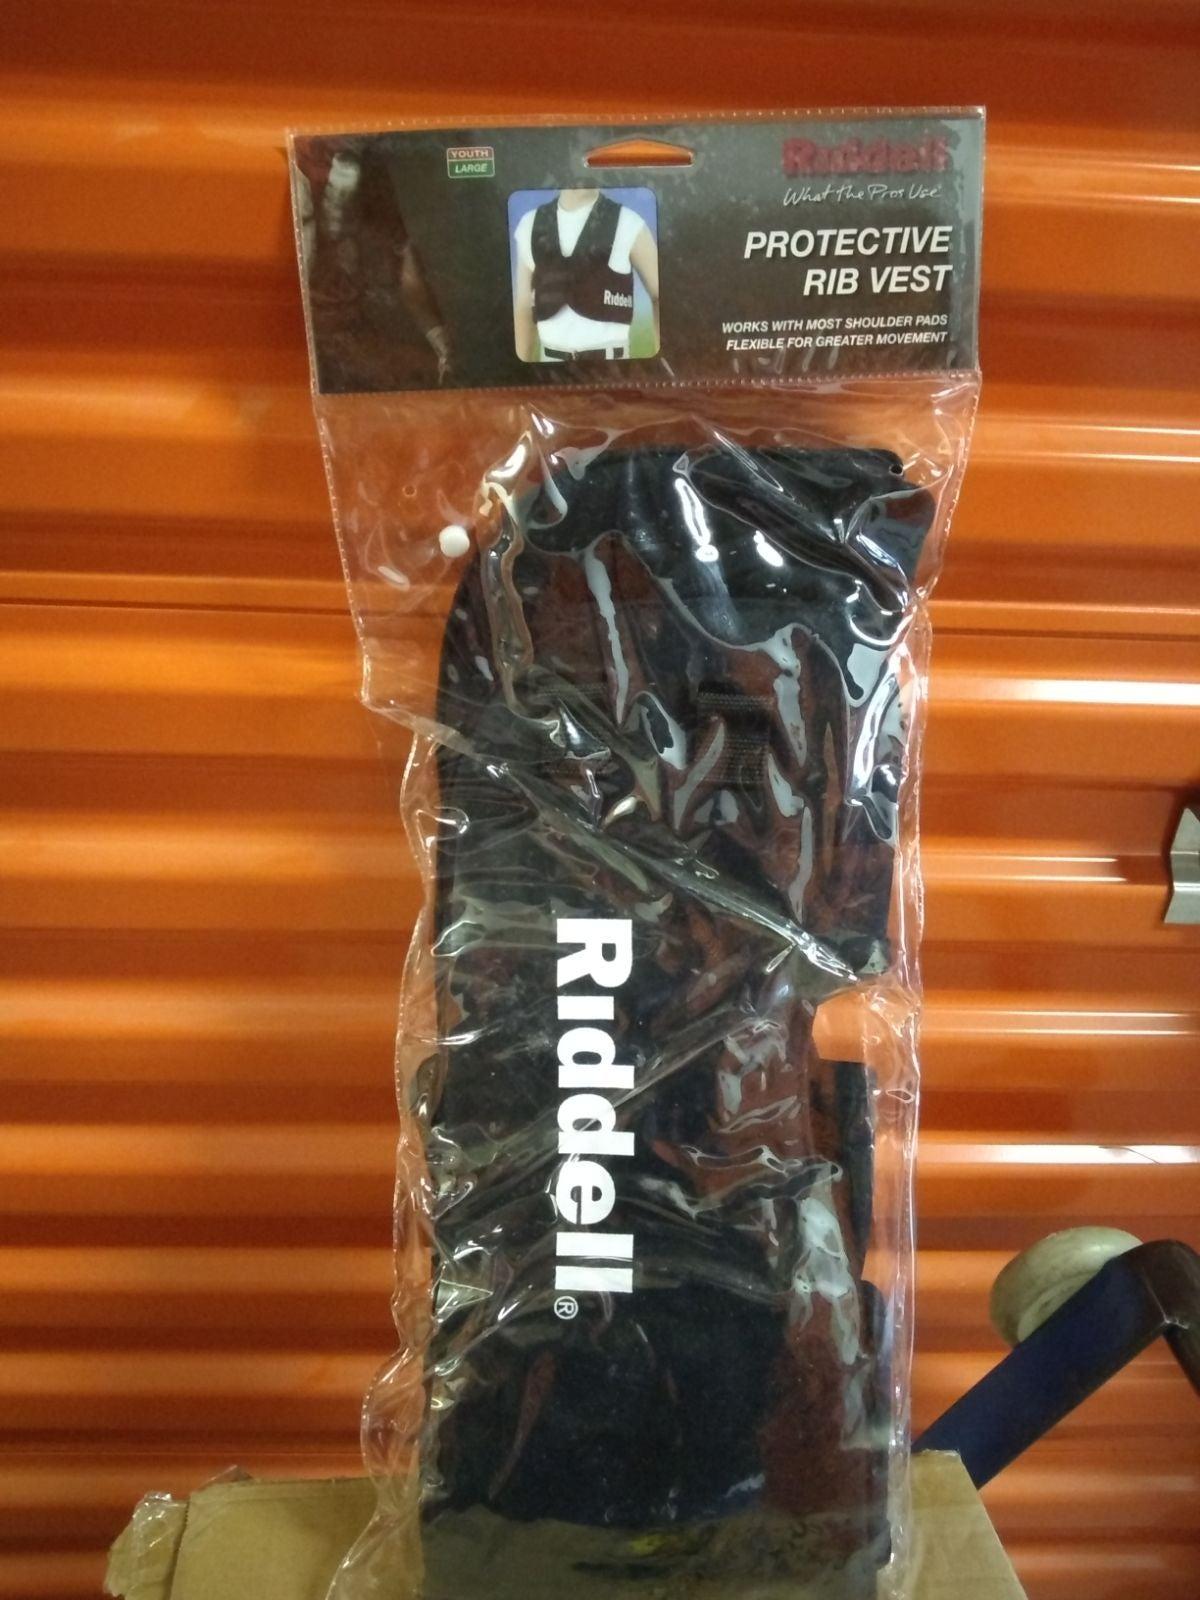 Protector rib vest